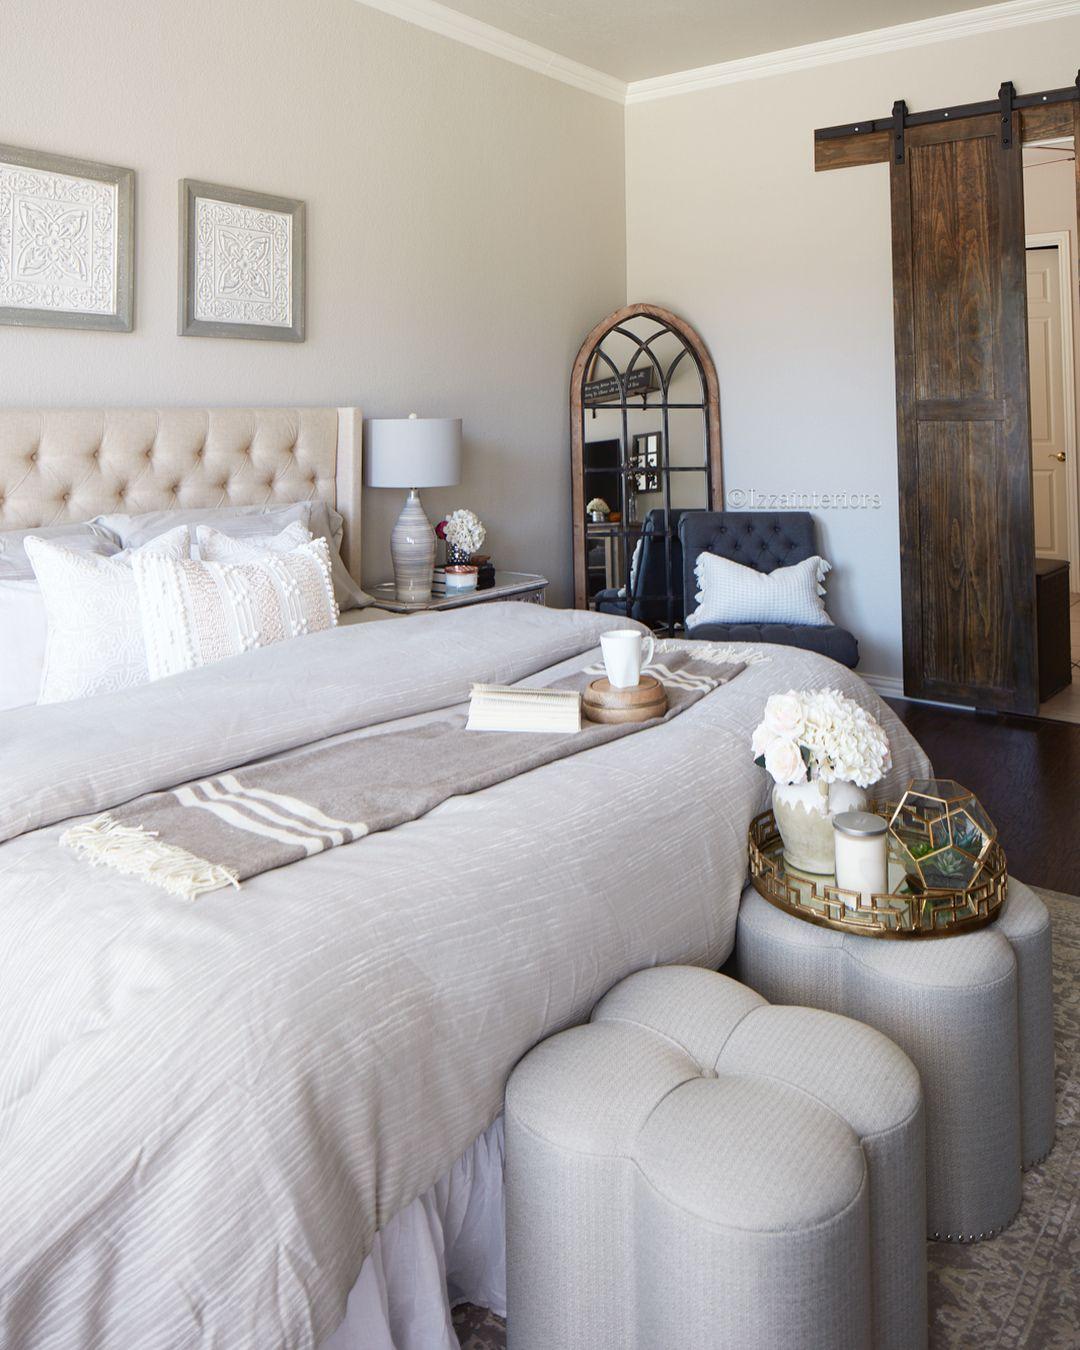 5th wheel master bedroom  Pin by Xoxo Xoxo on bedroom  Pinterest  Interiors Bedrooms